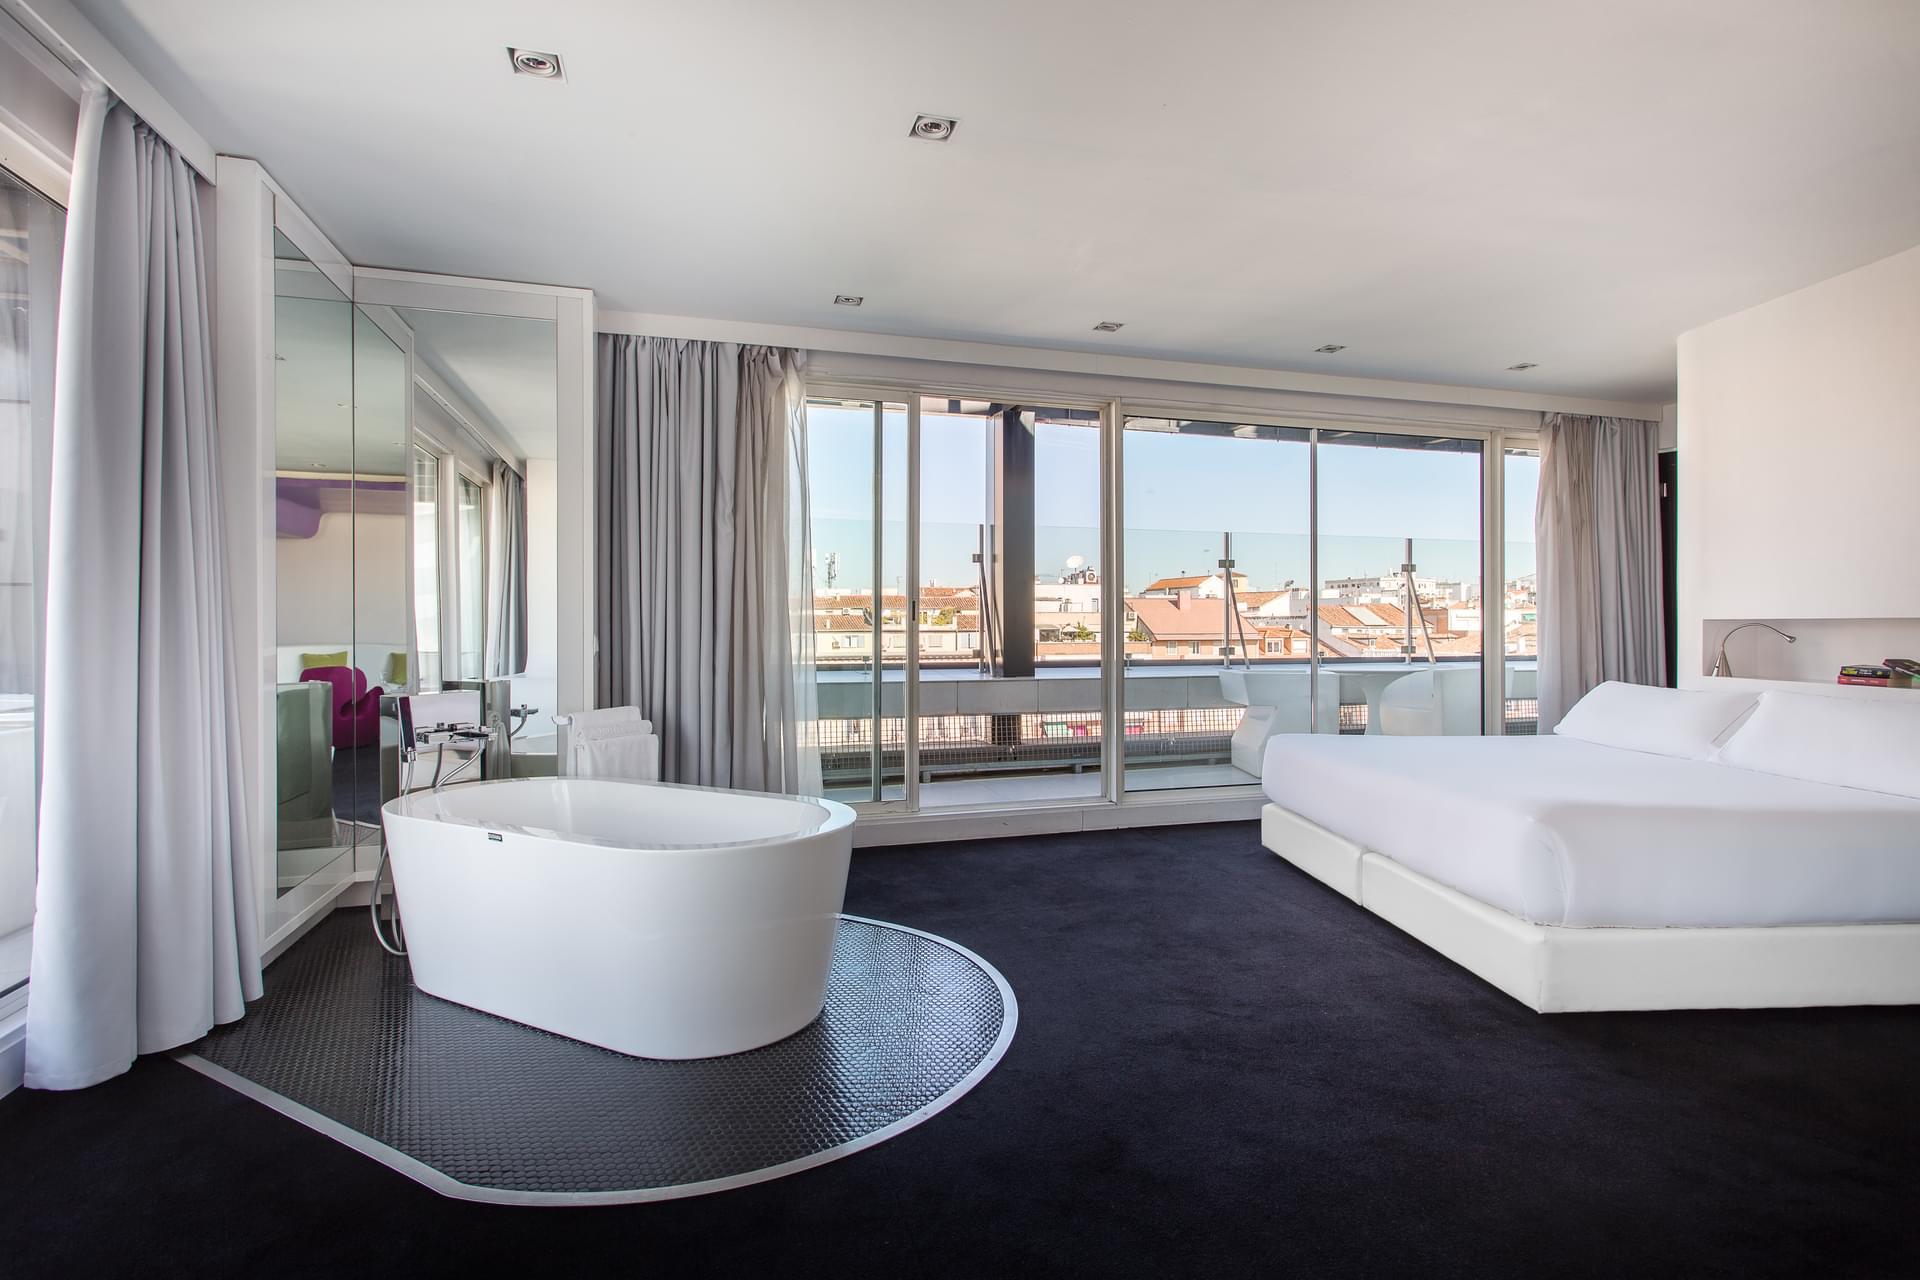 Oscar Room Mate Hotels, arquitectura de interiores para hoteles